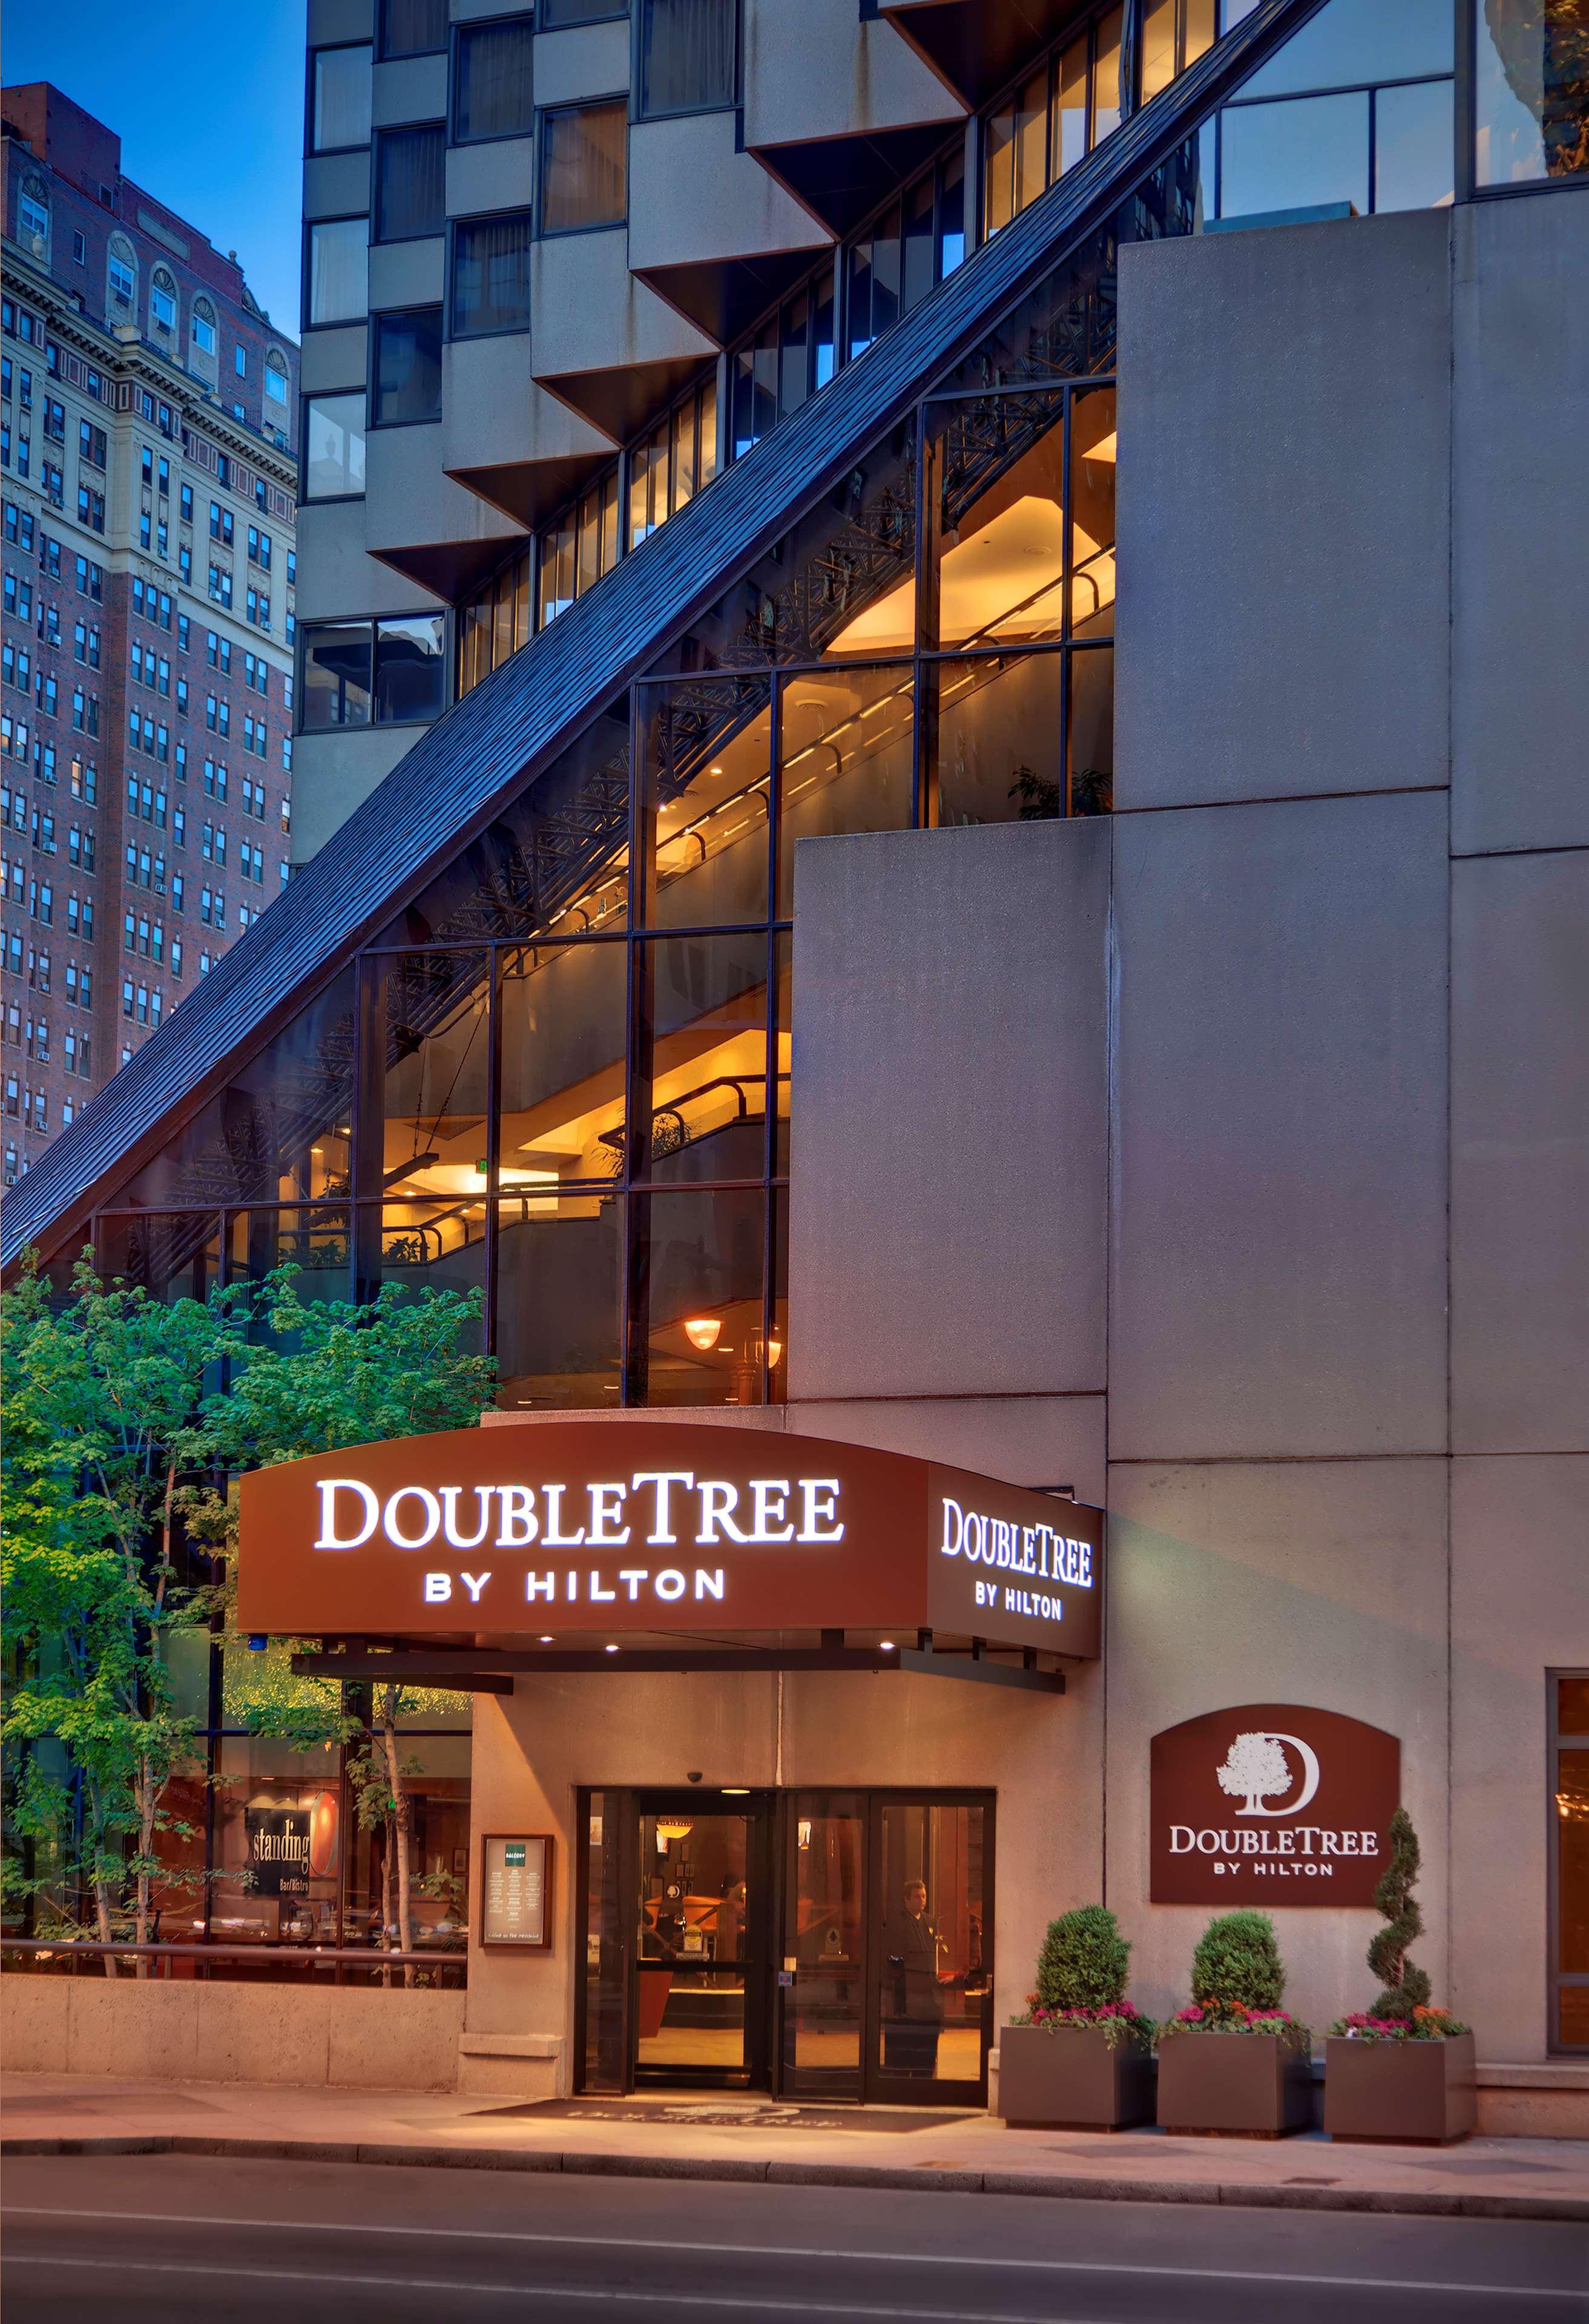 doubletree by hilton hotel philadelphia center city. Black Bedroom Furniture Sets. Home Design Ideas